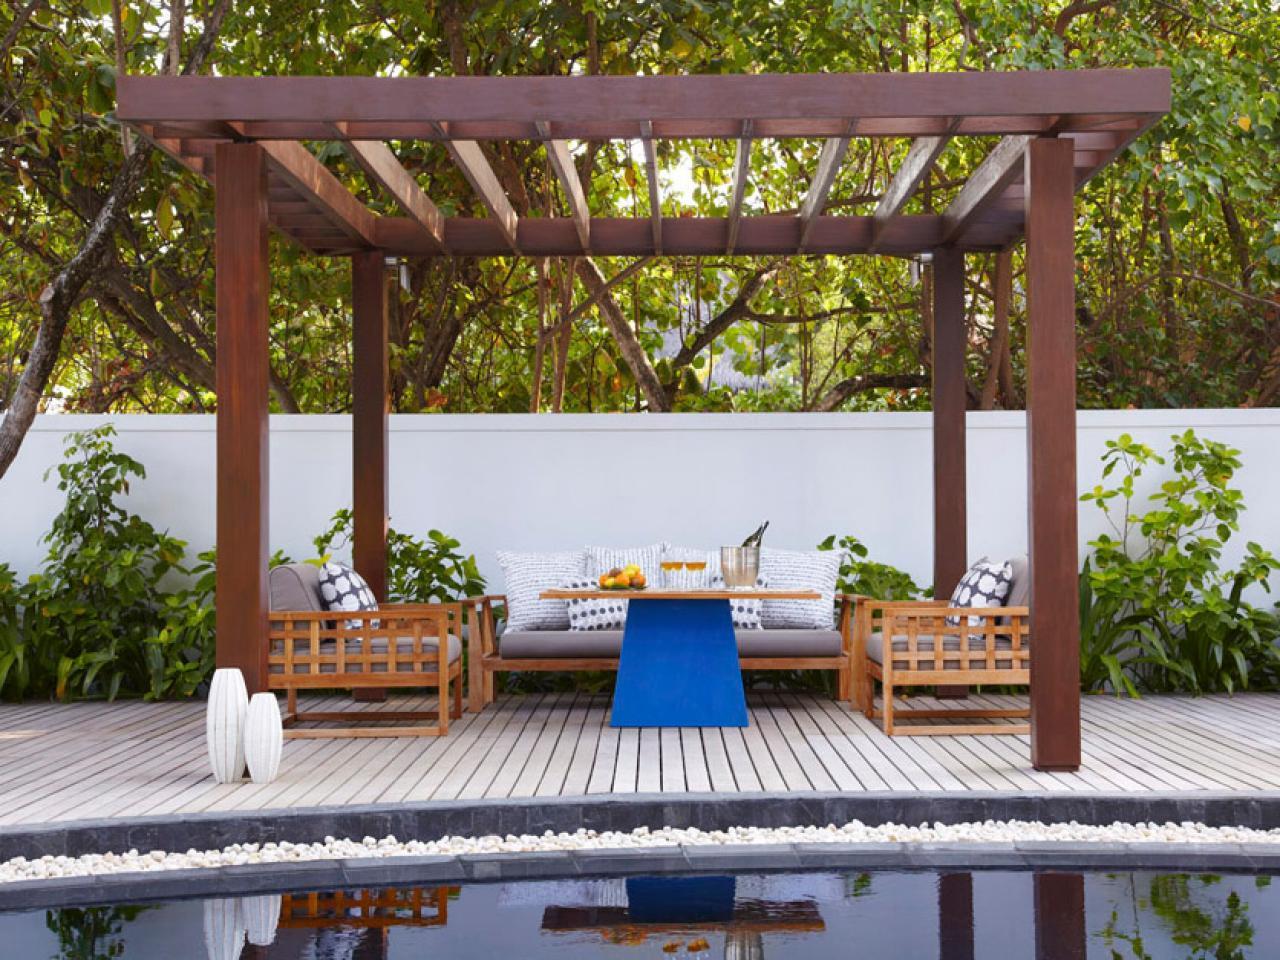 ci_viceroy-hotels-maldives-pergola-poolside_s4x3-jpg-rend-hgtvcom-1280-960